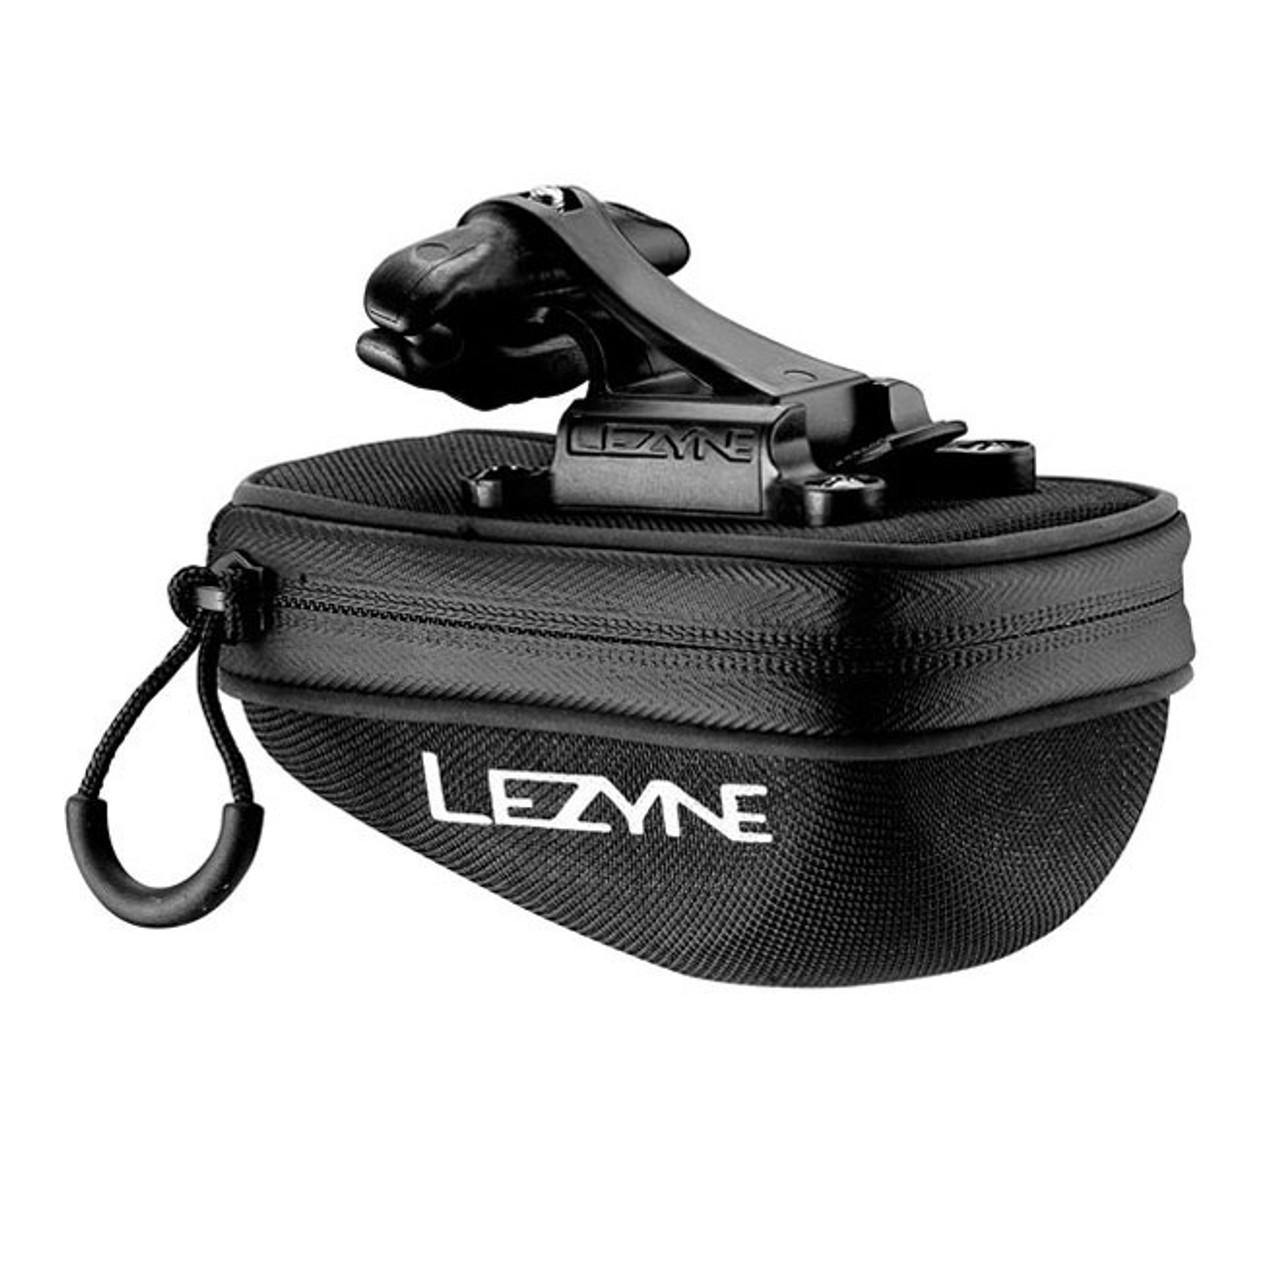 Lezyne Pod Caddy M QR Saddle Bag In Black